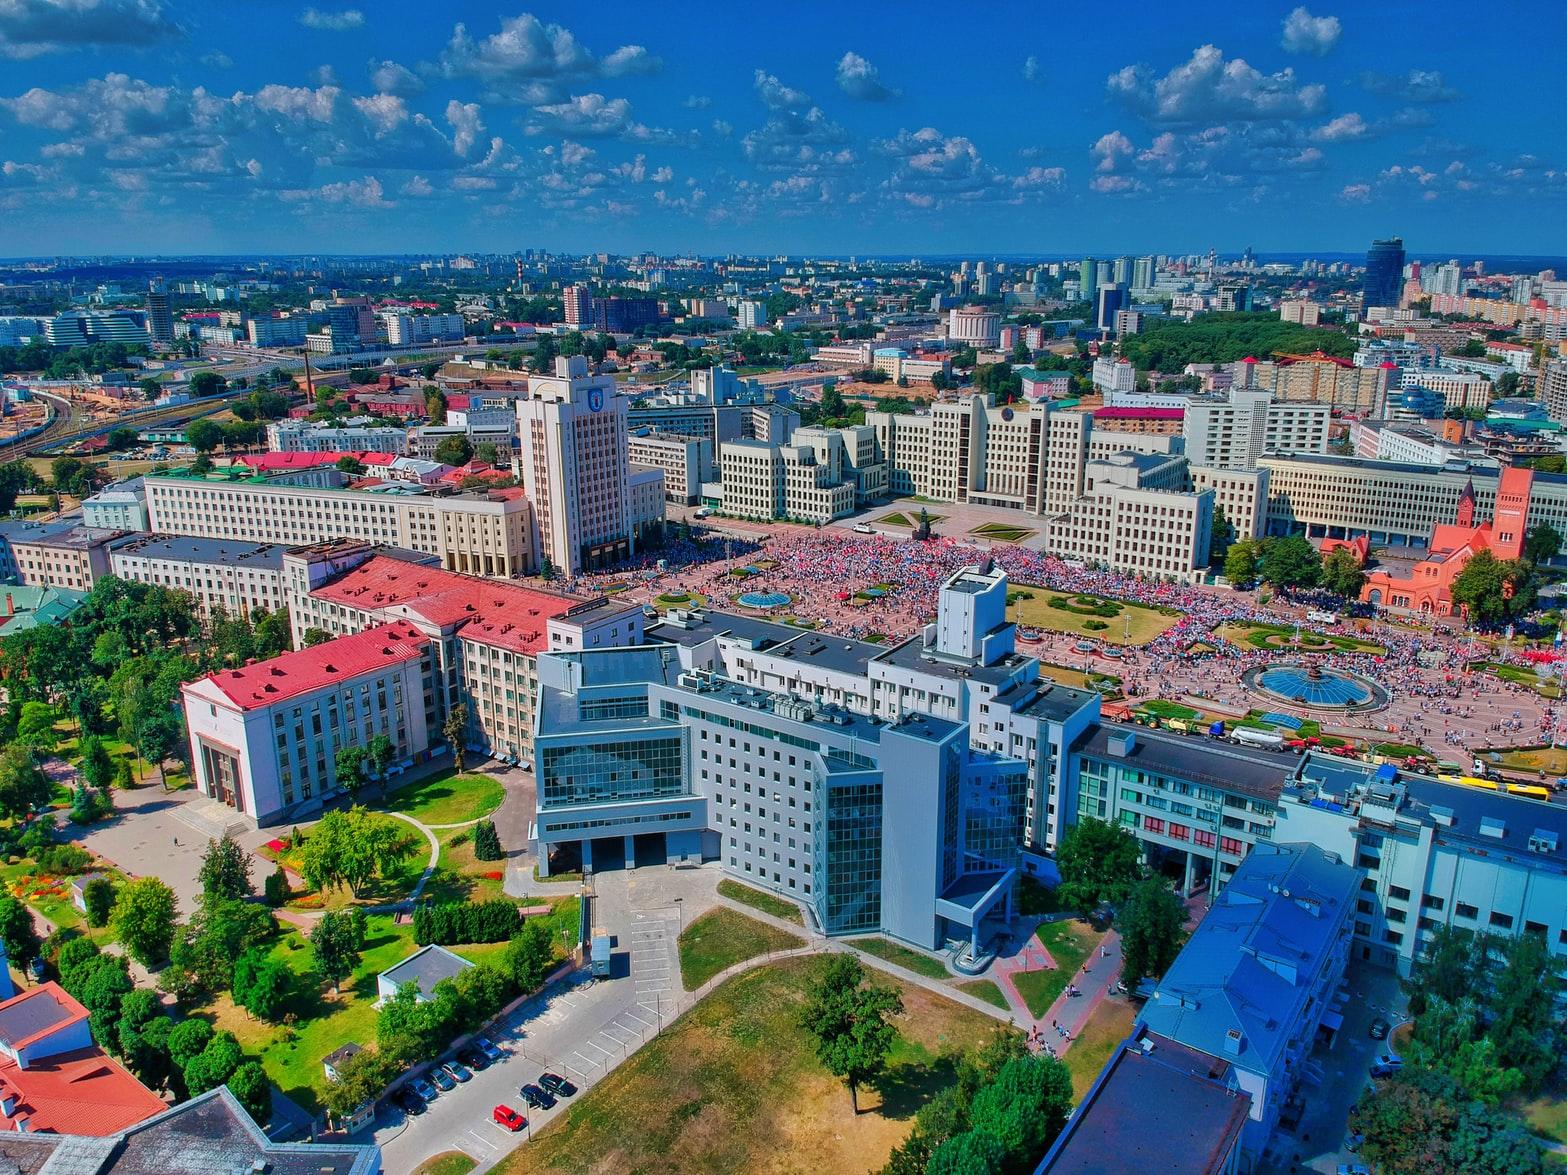 Auslandspraktikum in Belarus - Minsk